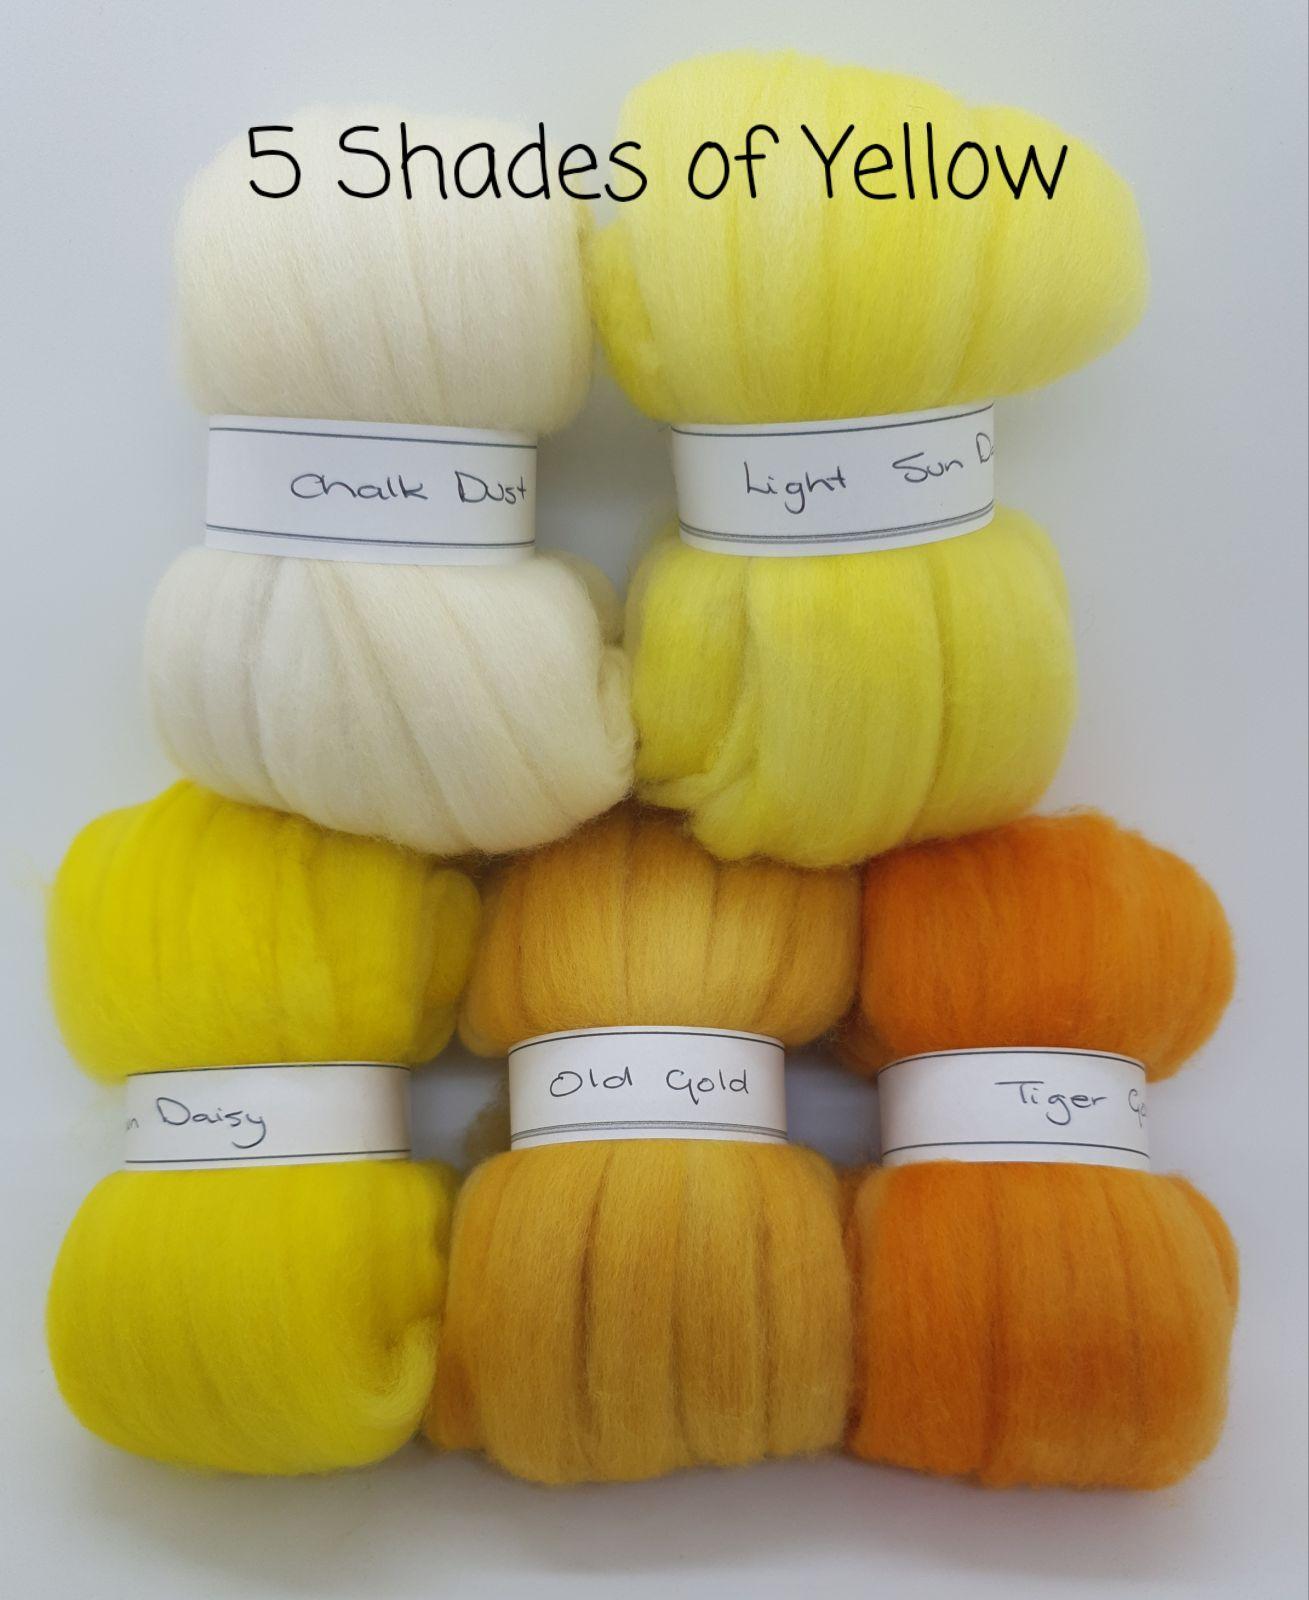 5 Shades of Yellow